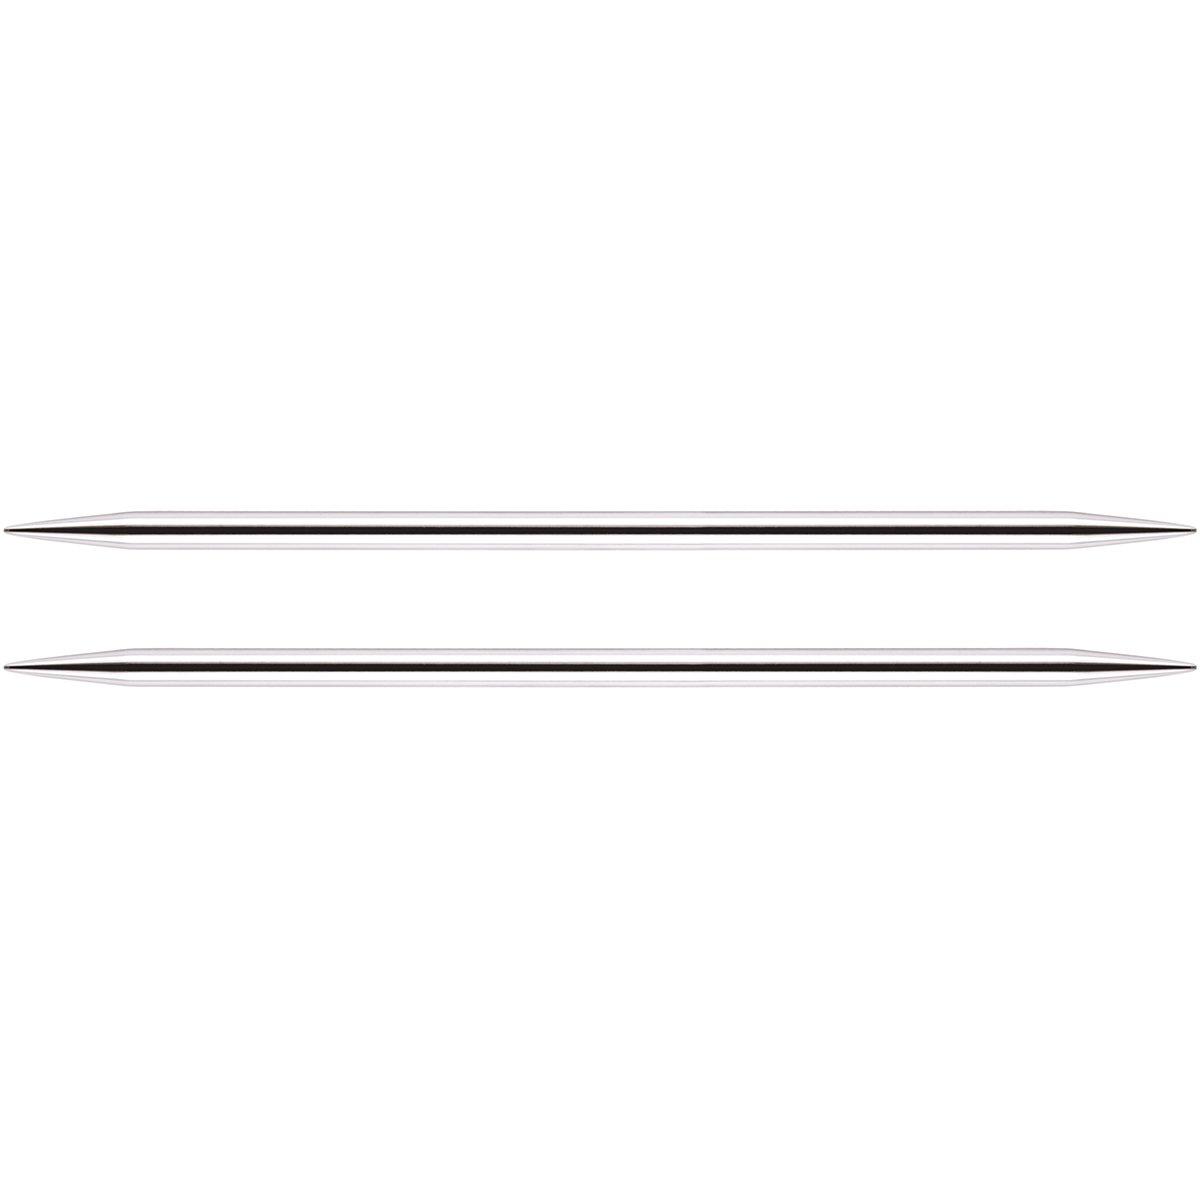 Knitter's Pride 10.75/7mm Nova Platina Double Pointed Needles, 8 by Knitter's Pride B00XV1R51C